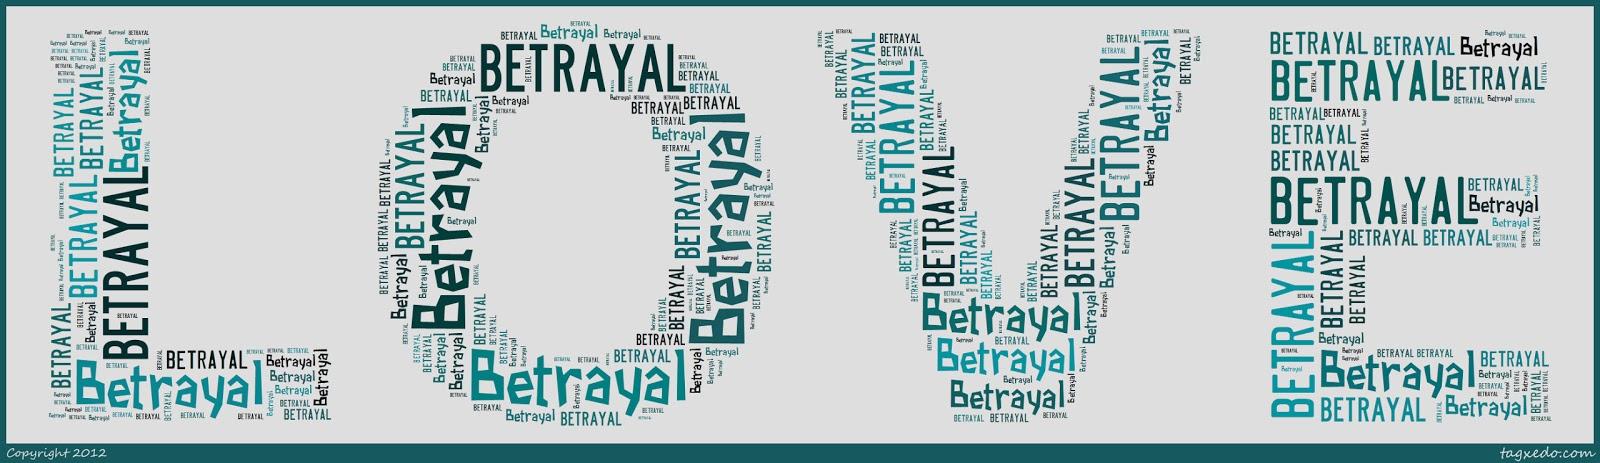 Betrayal Essays